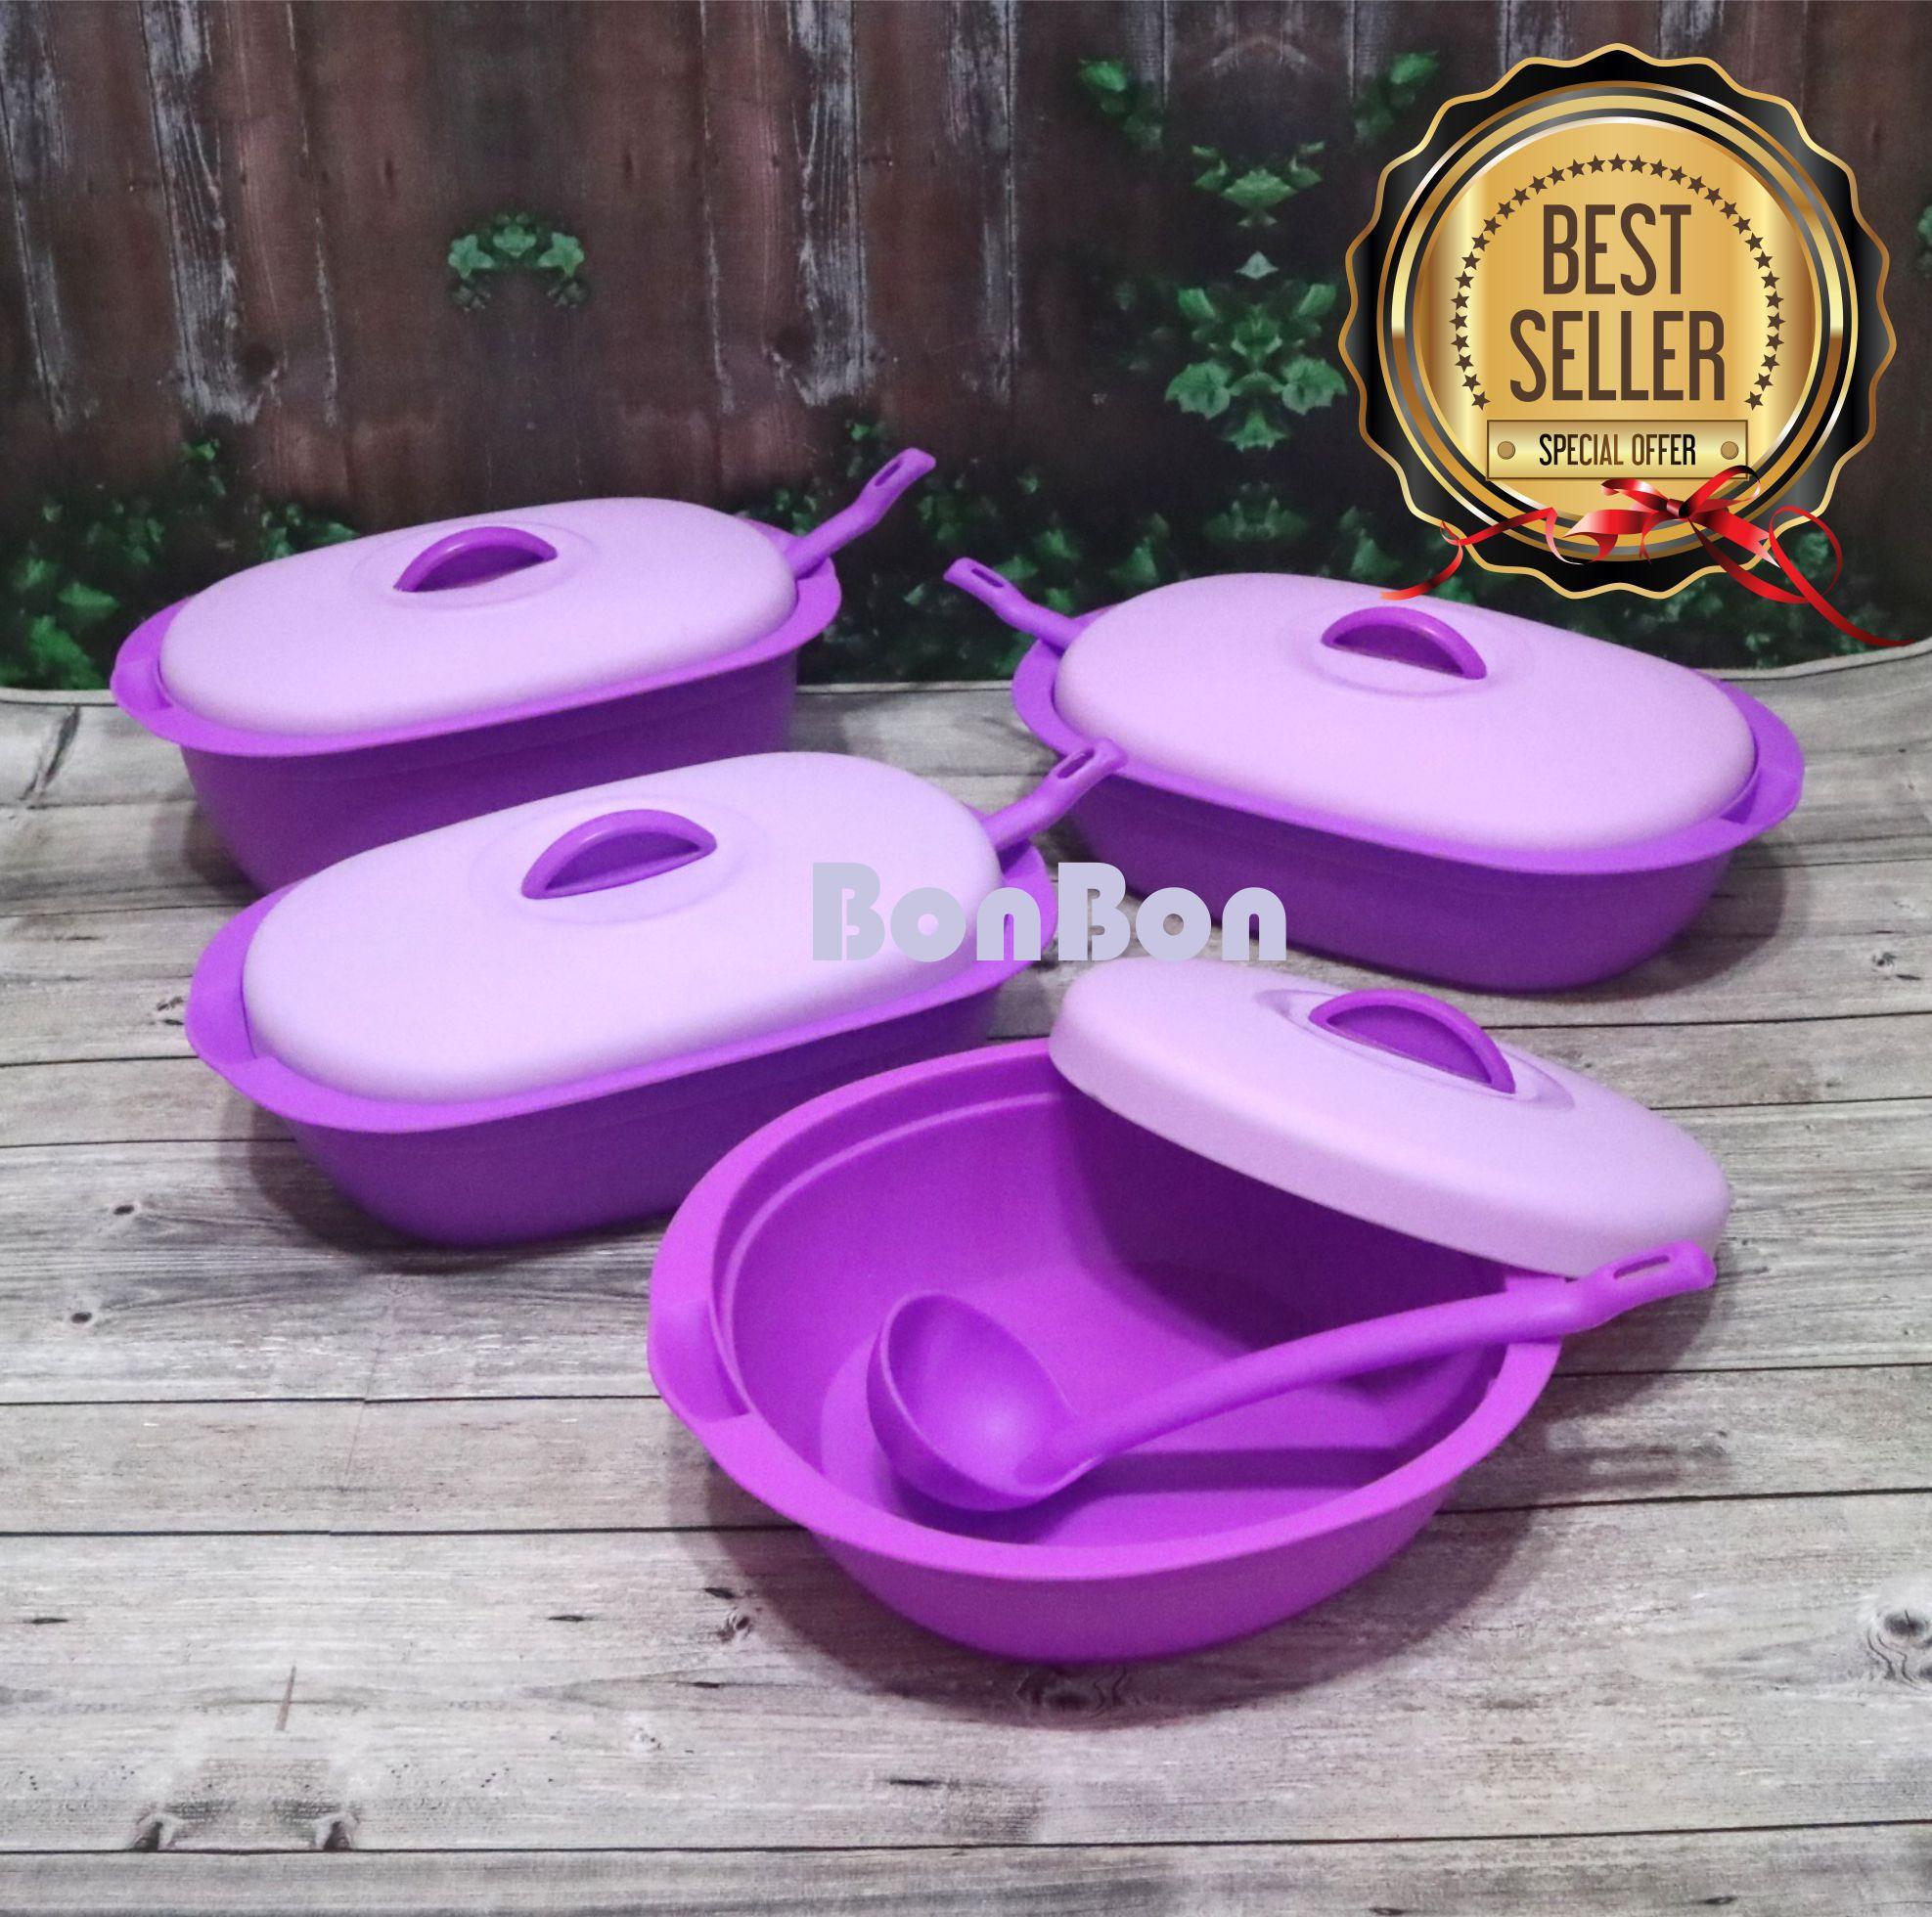 Alat Penyaji Makanan Termurah Plastik Wadah Cd Bonbon Saji Prasmanan Verona 4 Pcs Centong Ungu